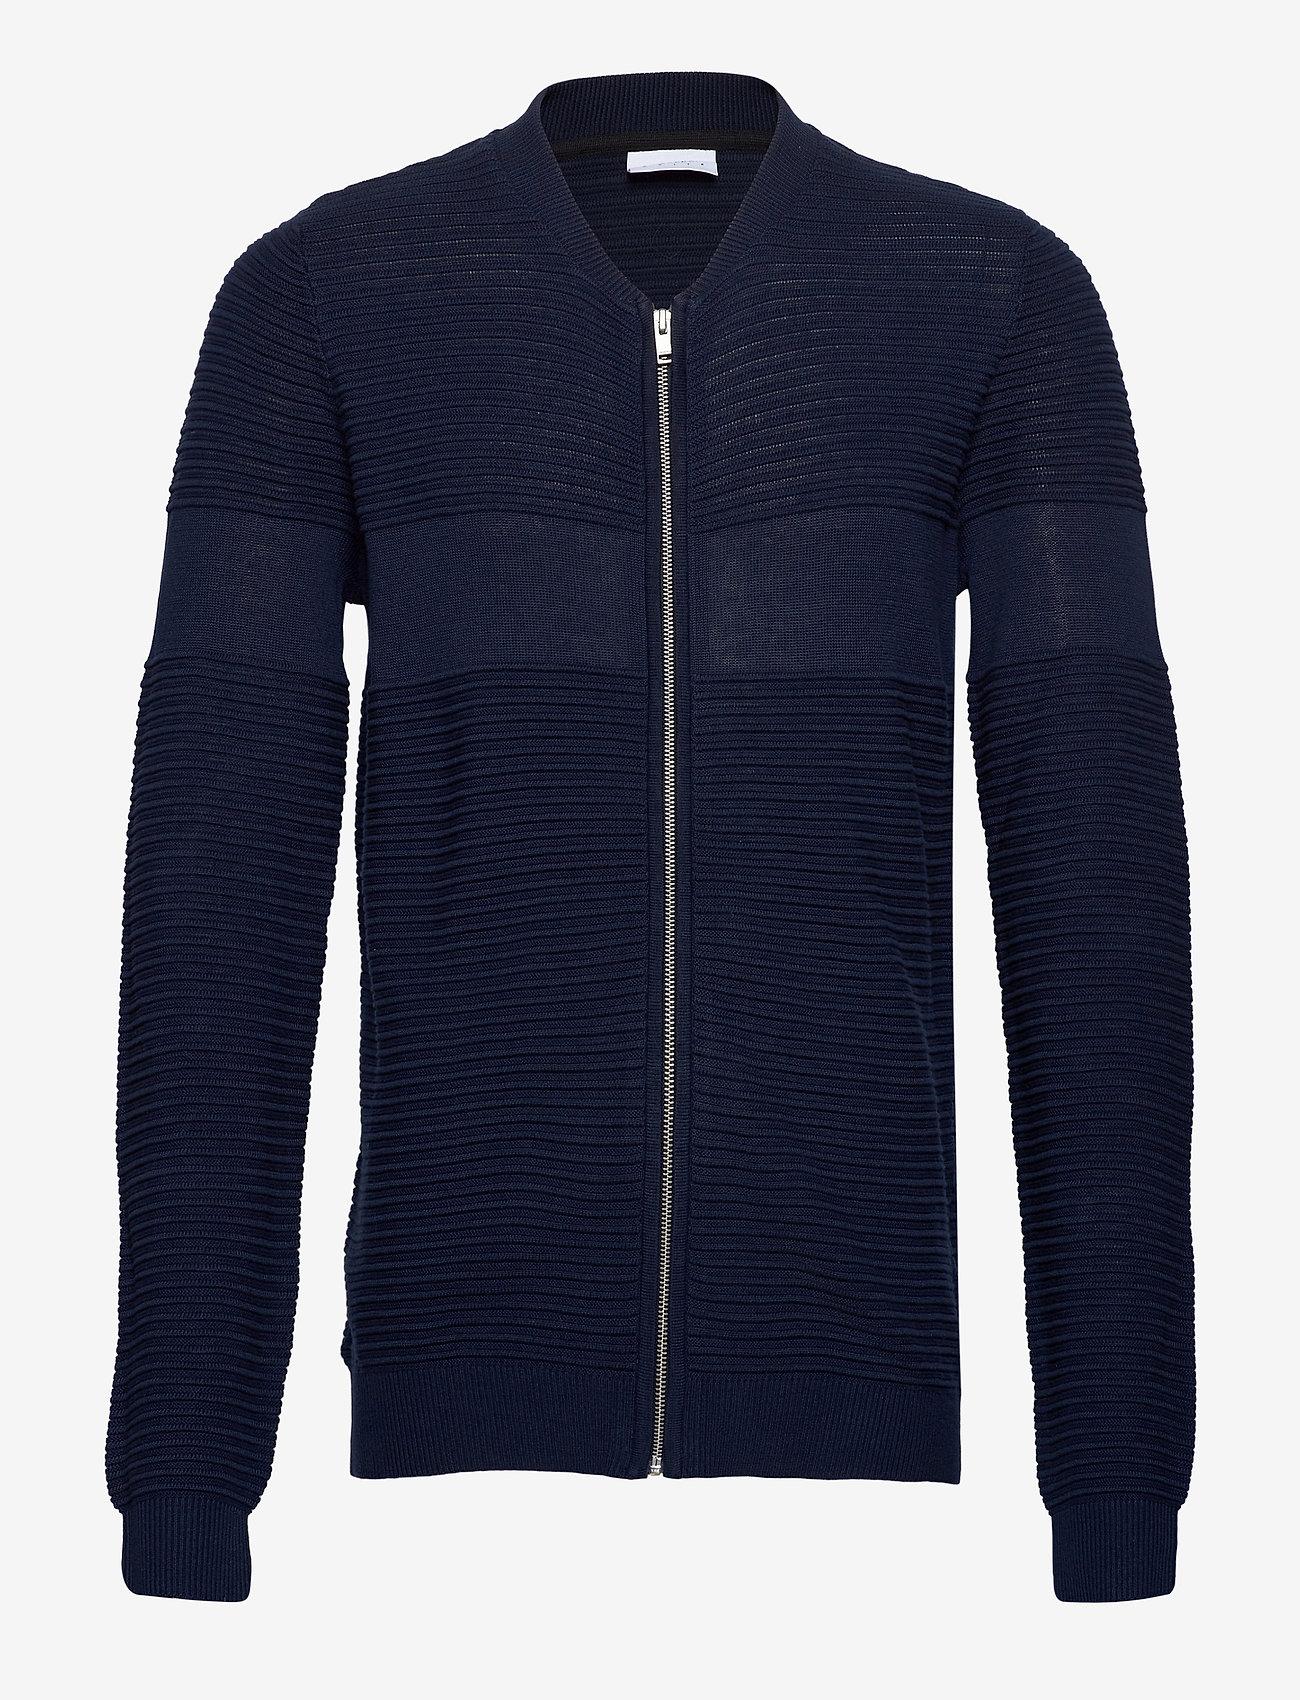 Lindbergh - Structured cardigan - perusneuleet - dk blue - 1